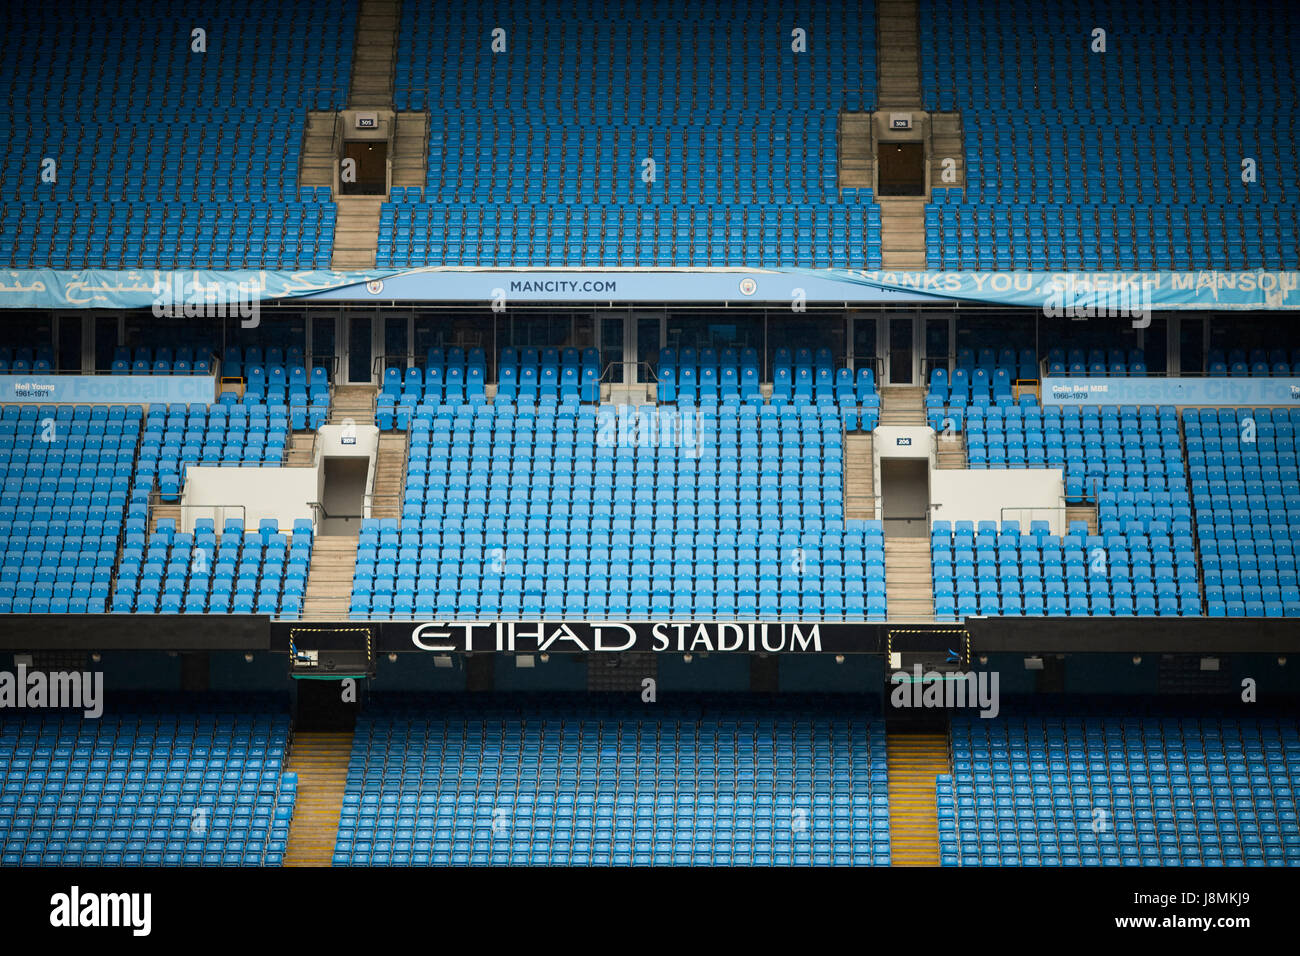 Manchester City Etihad Stadium posh seats with round logo. - Stock Image